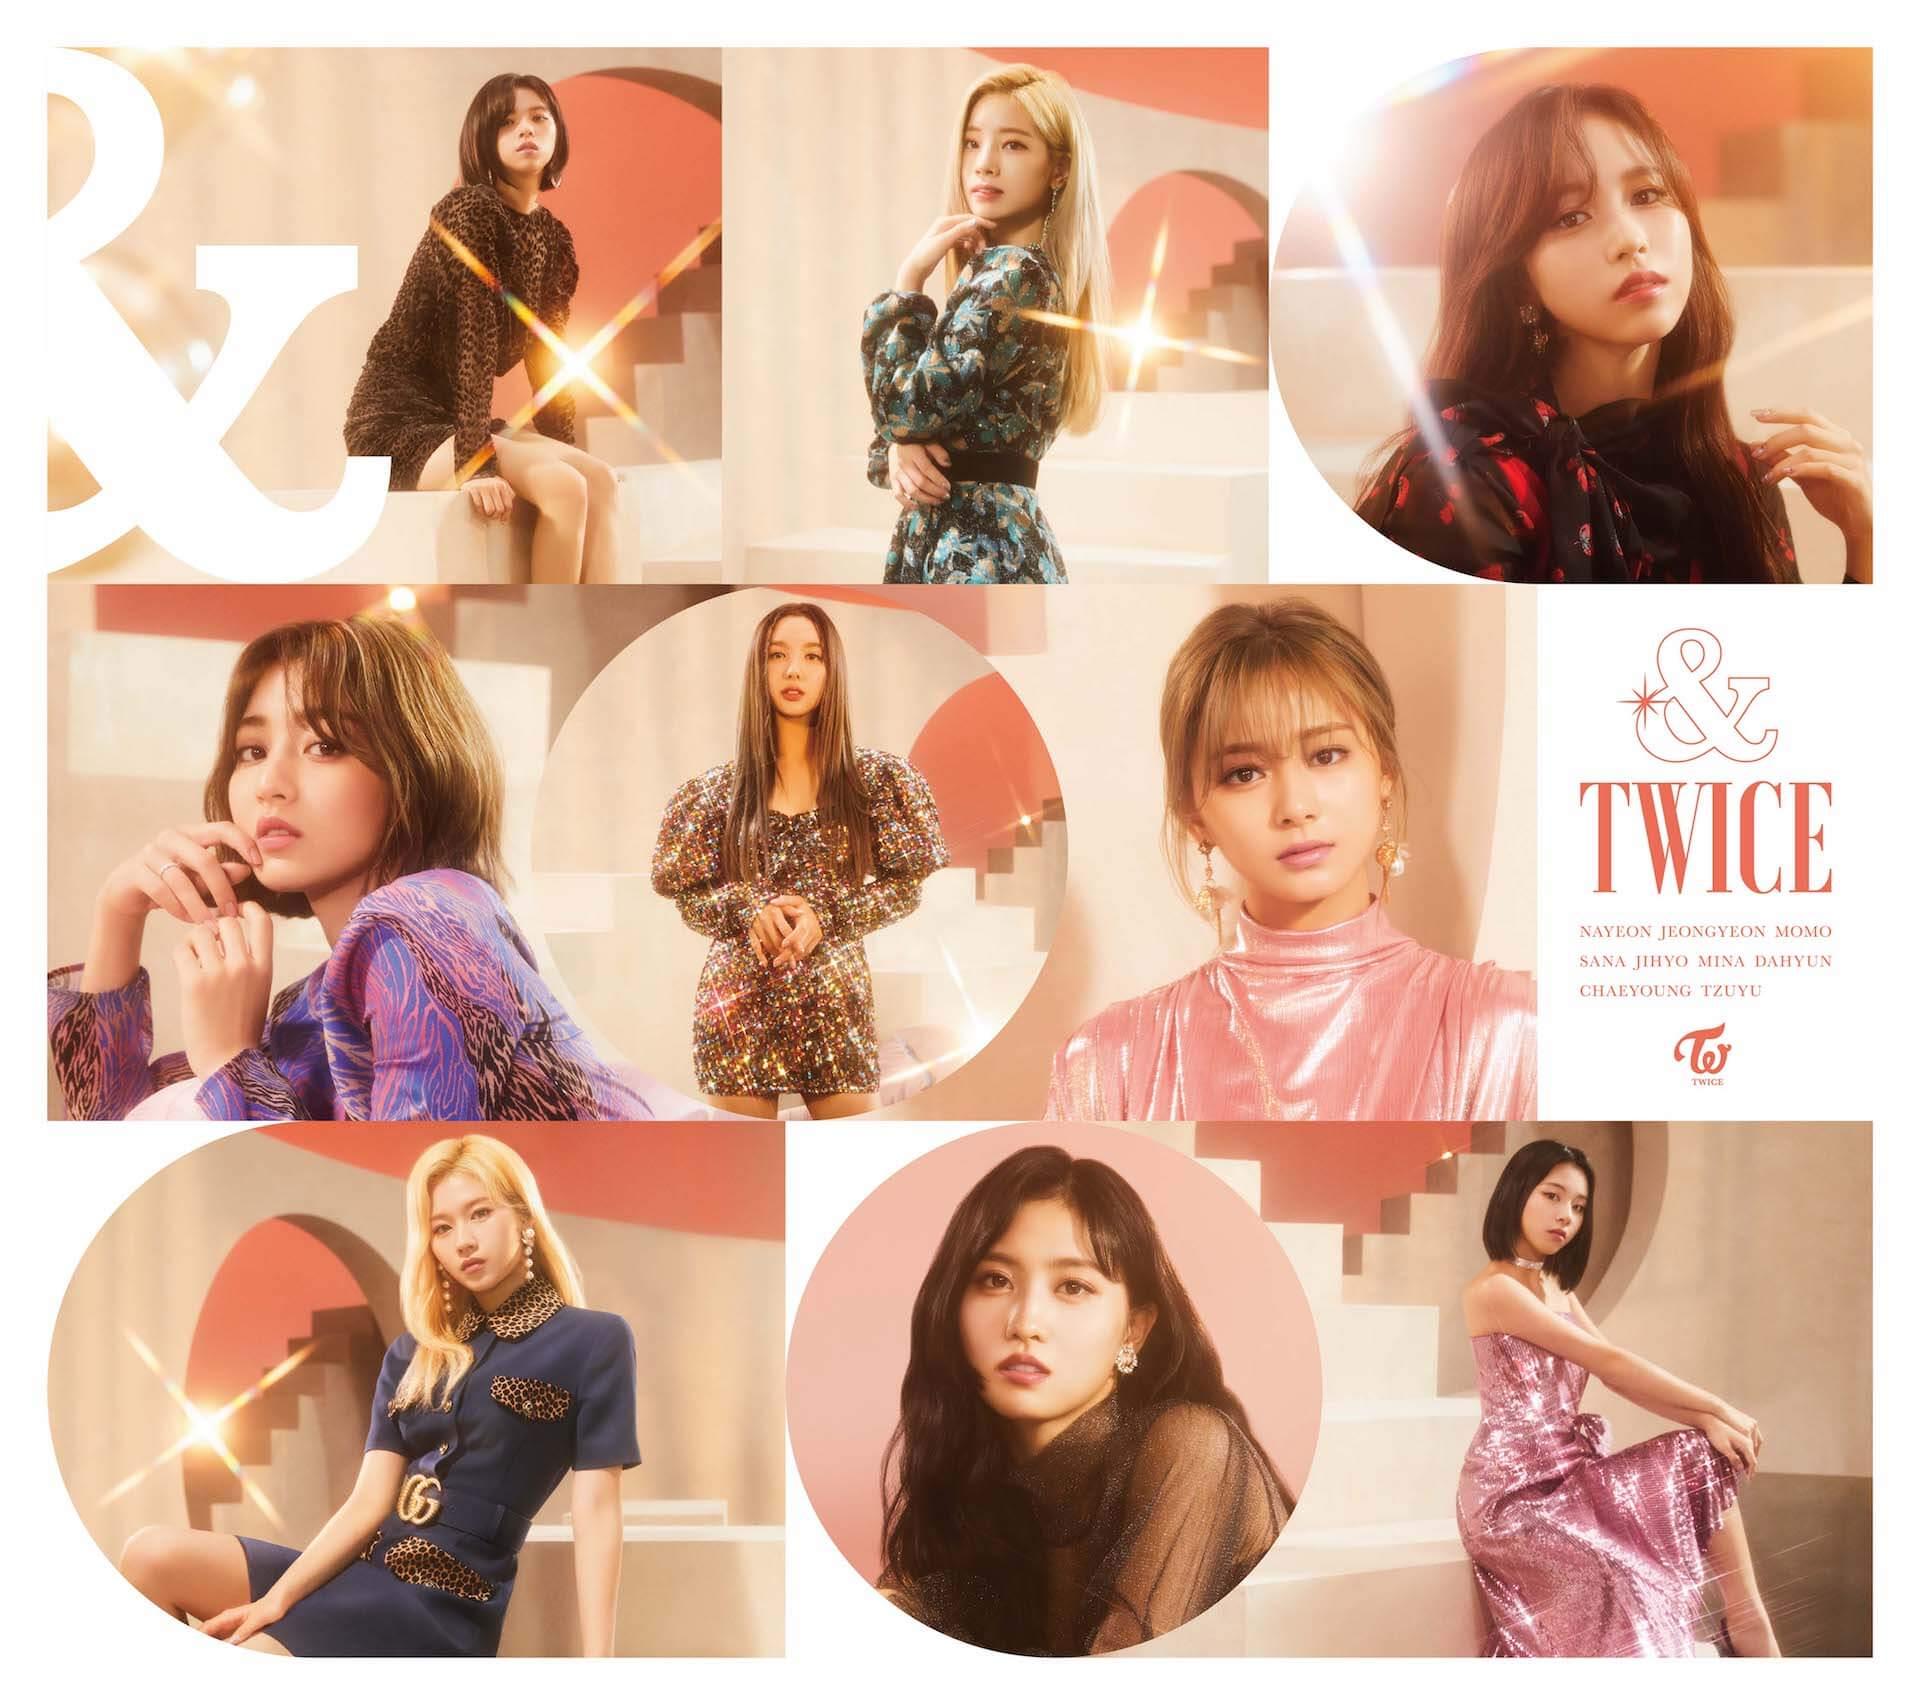 TWICEがJAPAN 2ndアルバム『&TWICE』から、リード曲「Fake & True」 のMVを解禁! music191018_twice_mv_3